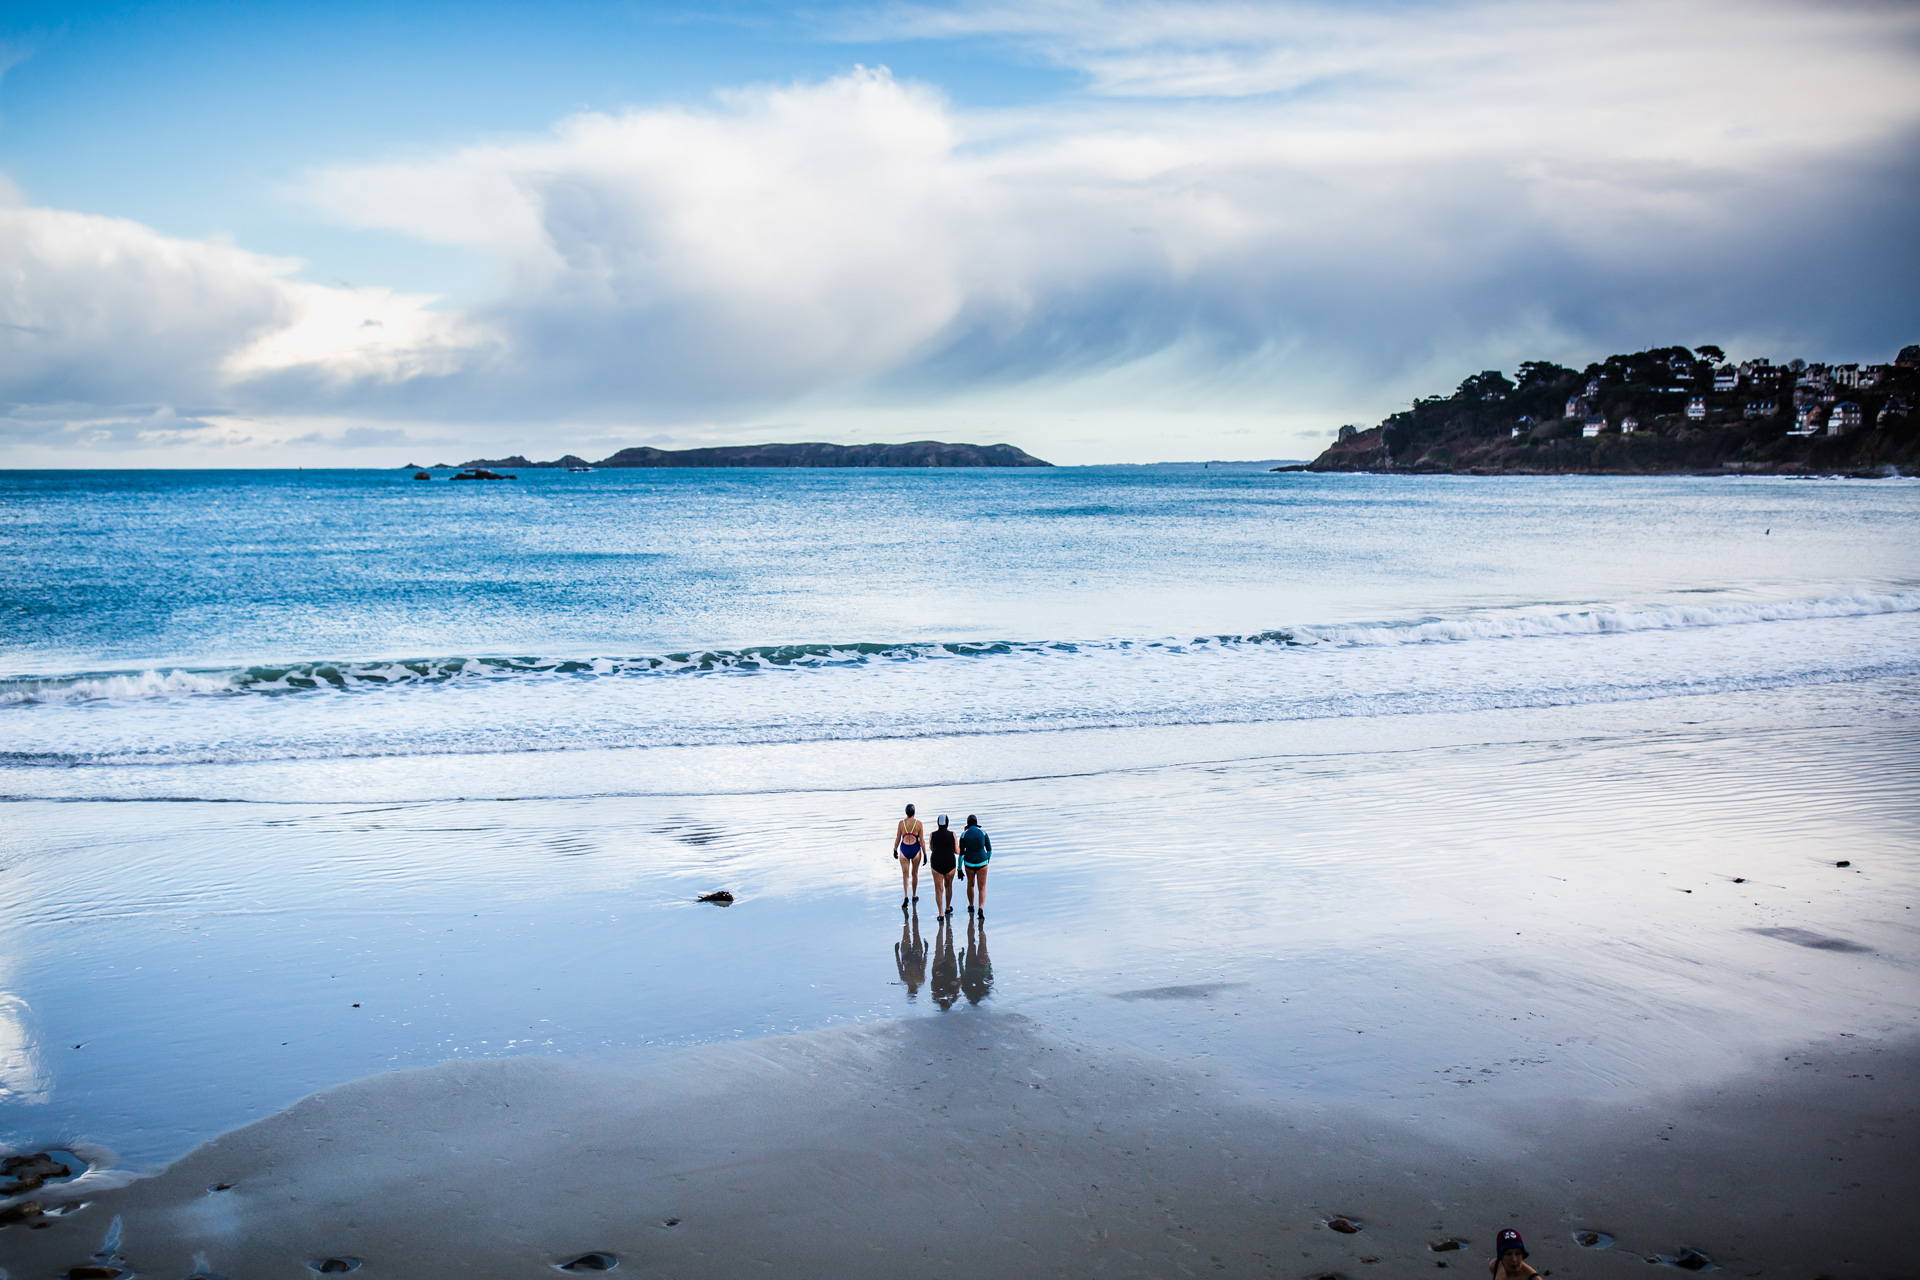 Baigneurs sur la plage de Trestraou, Perros-Guirec